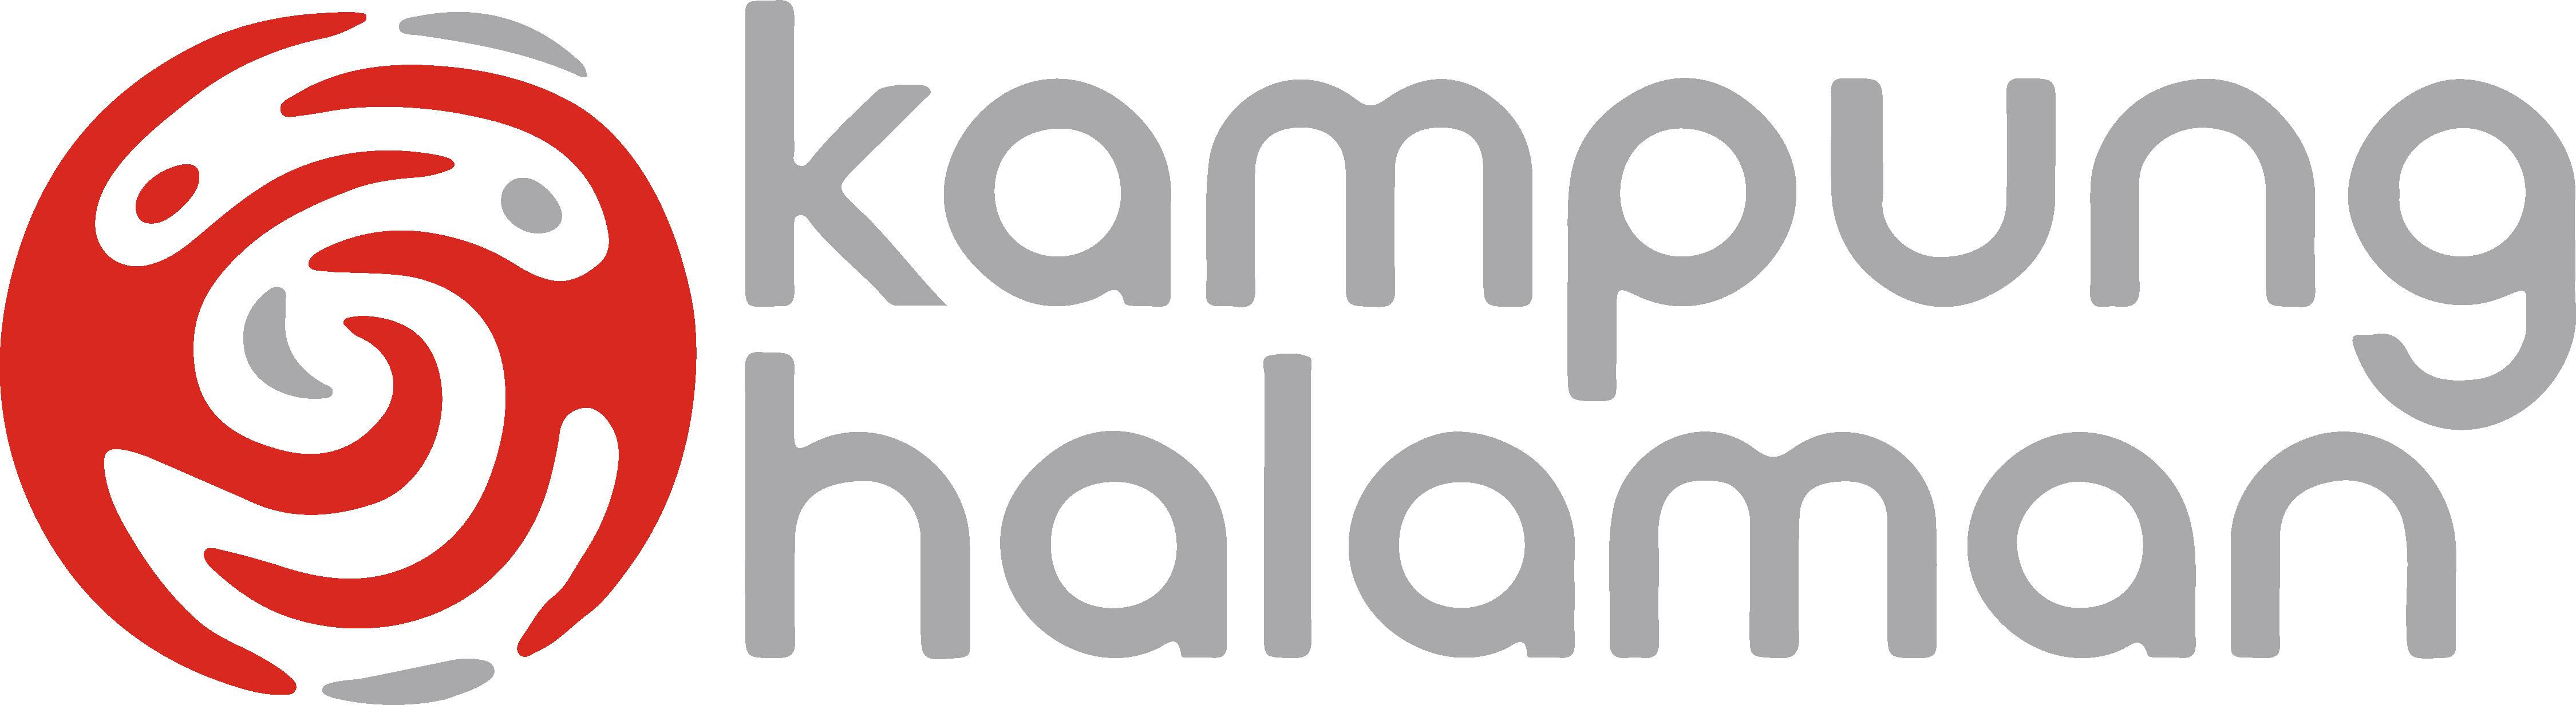 Yayasan Kampung Halaman